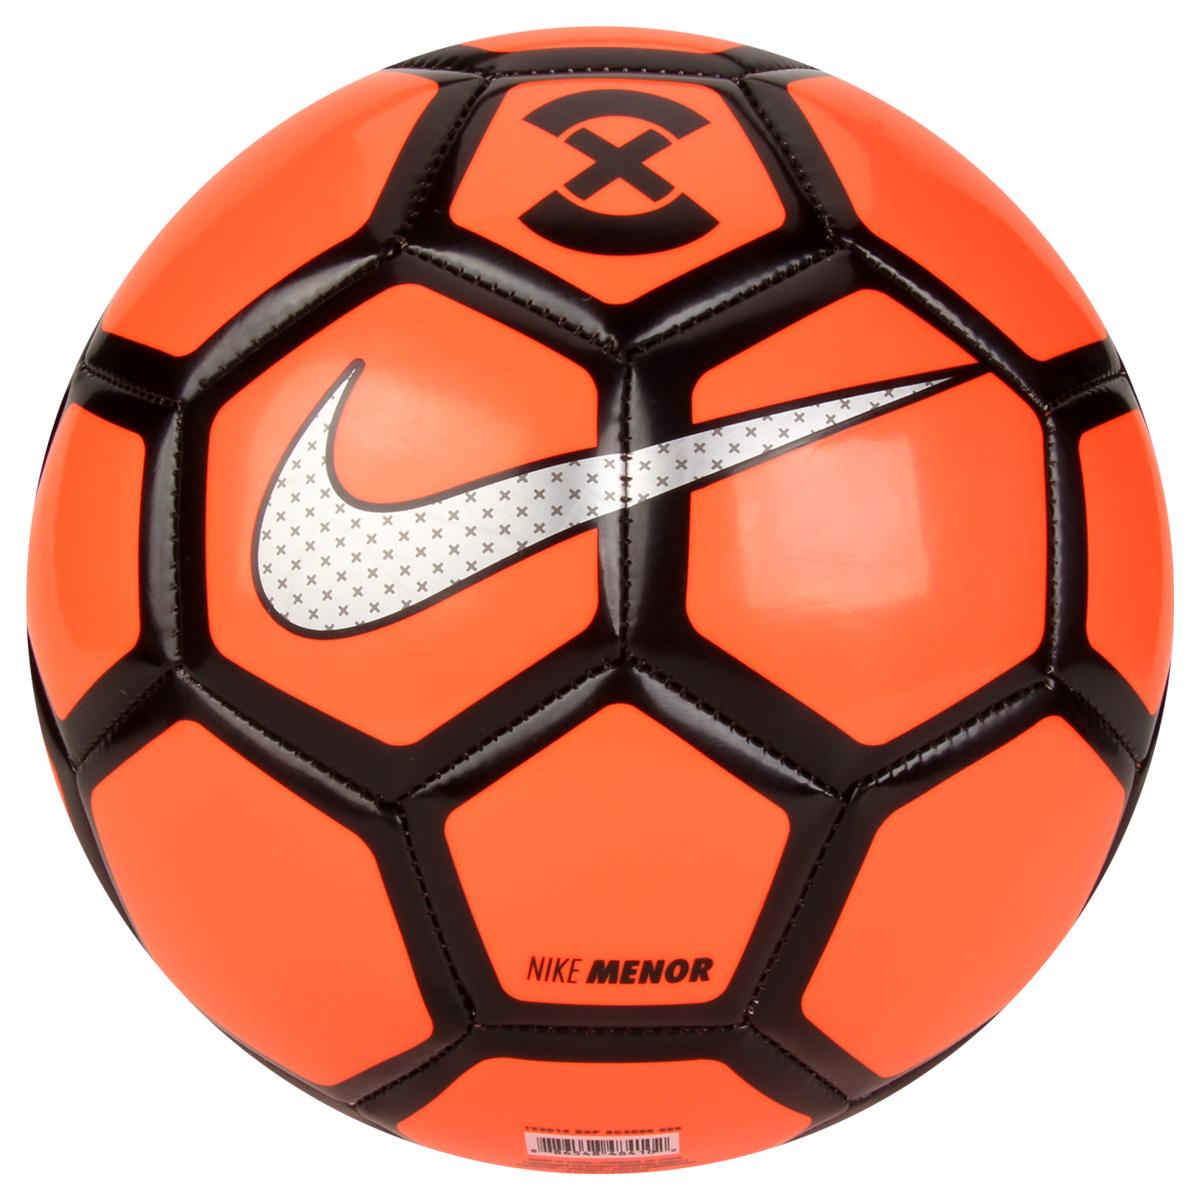 a8a00ddd4f Bola Futebol Nike FootballX Menor Futsal - Laranja e Preto